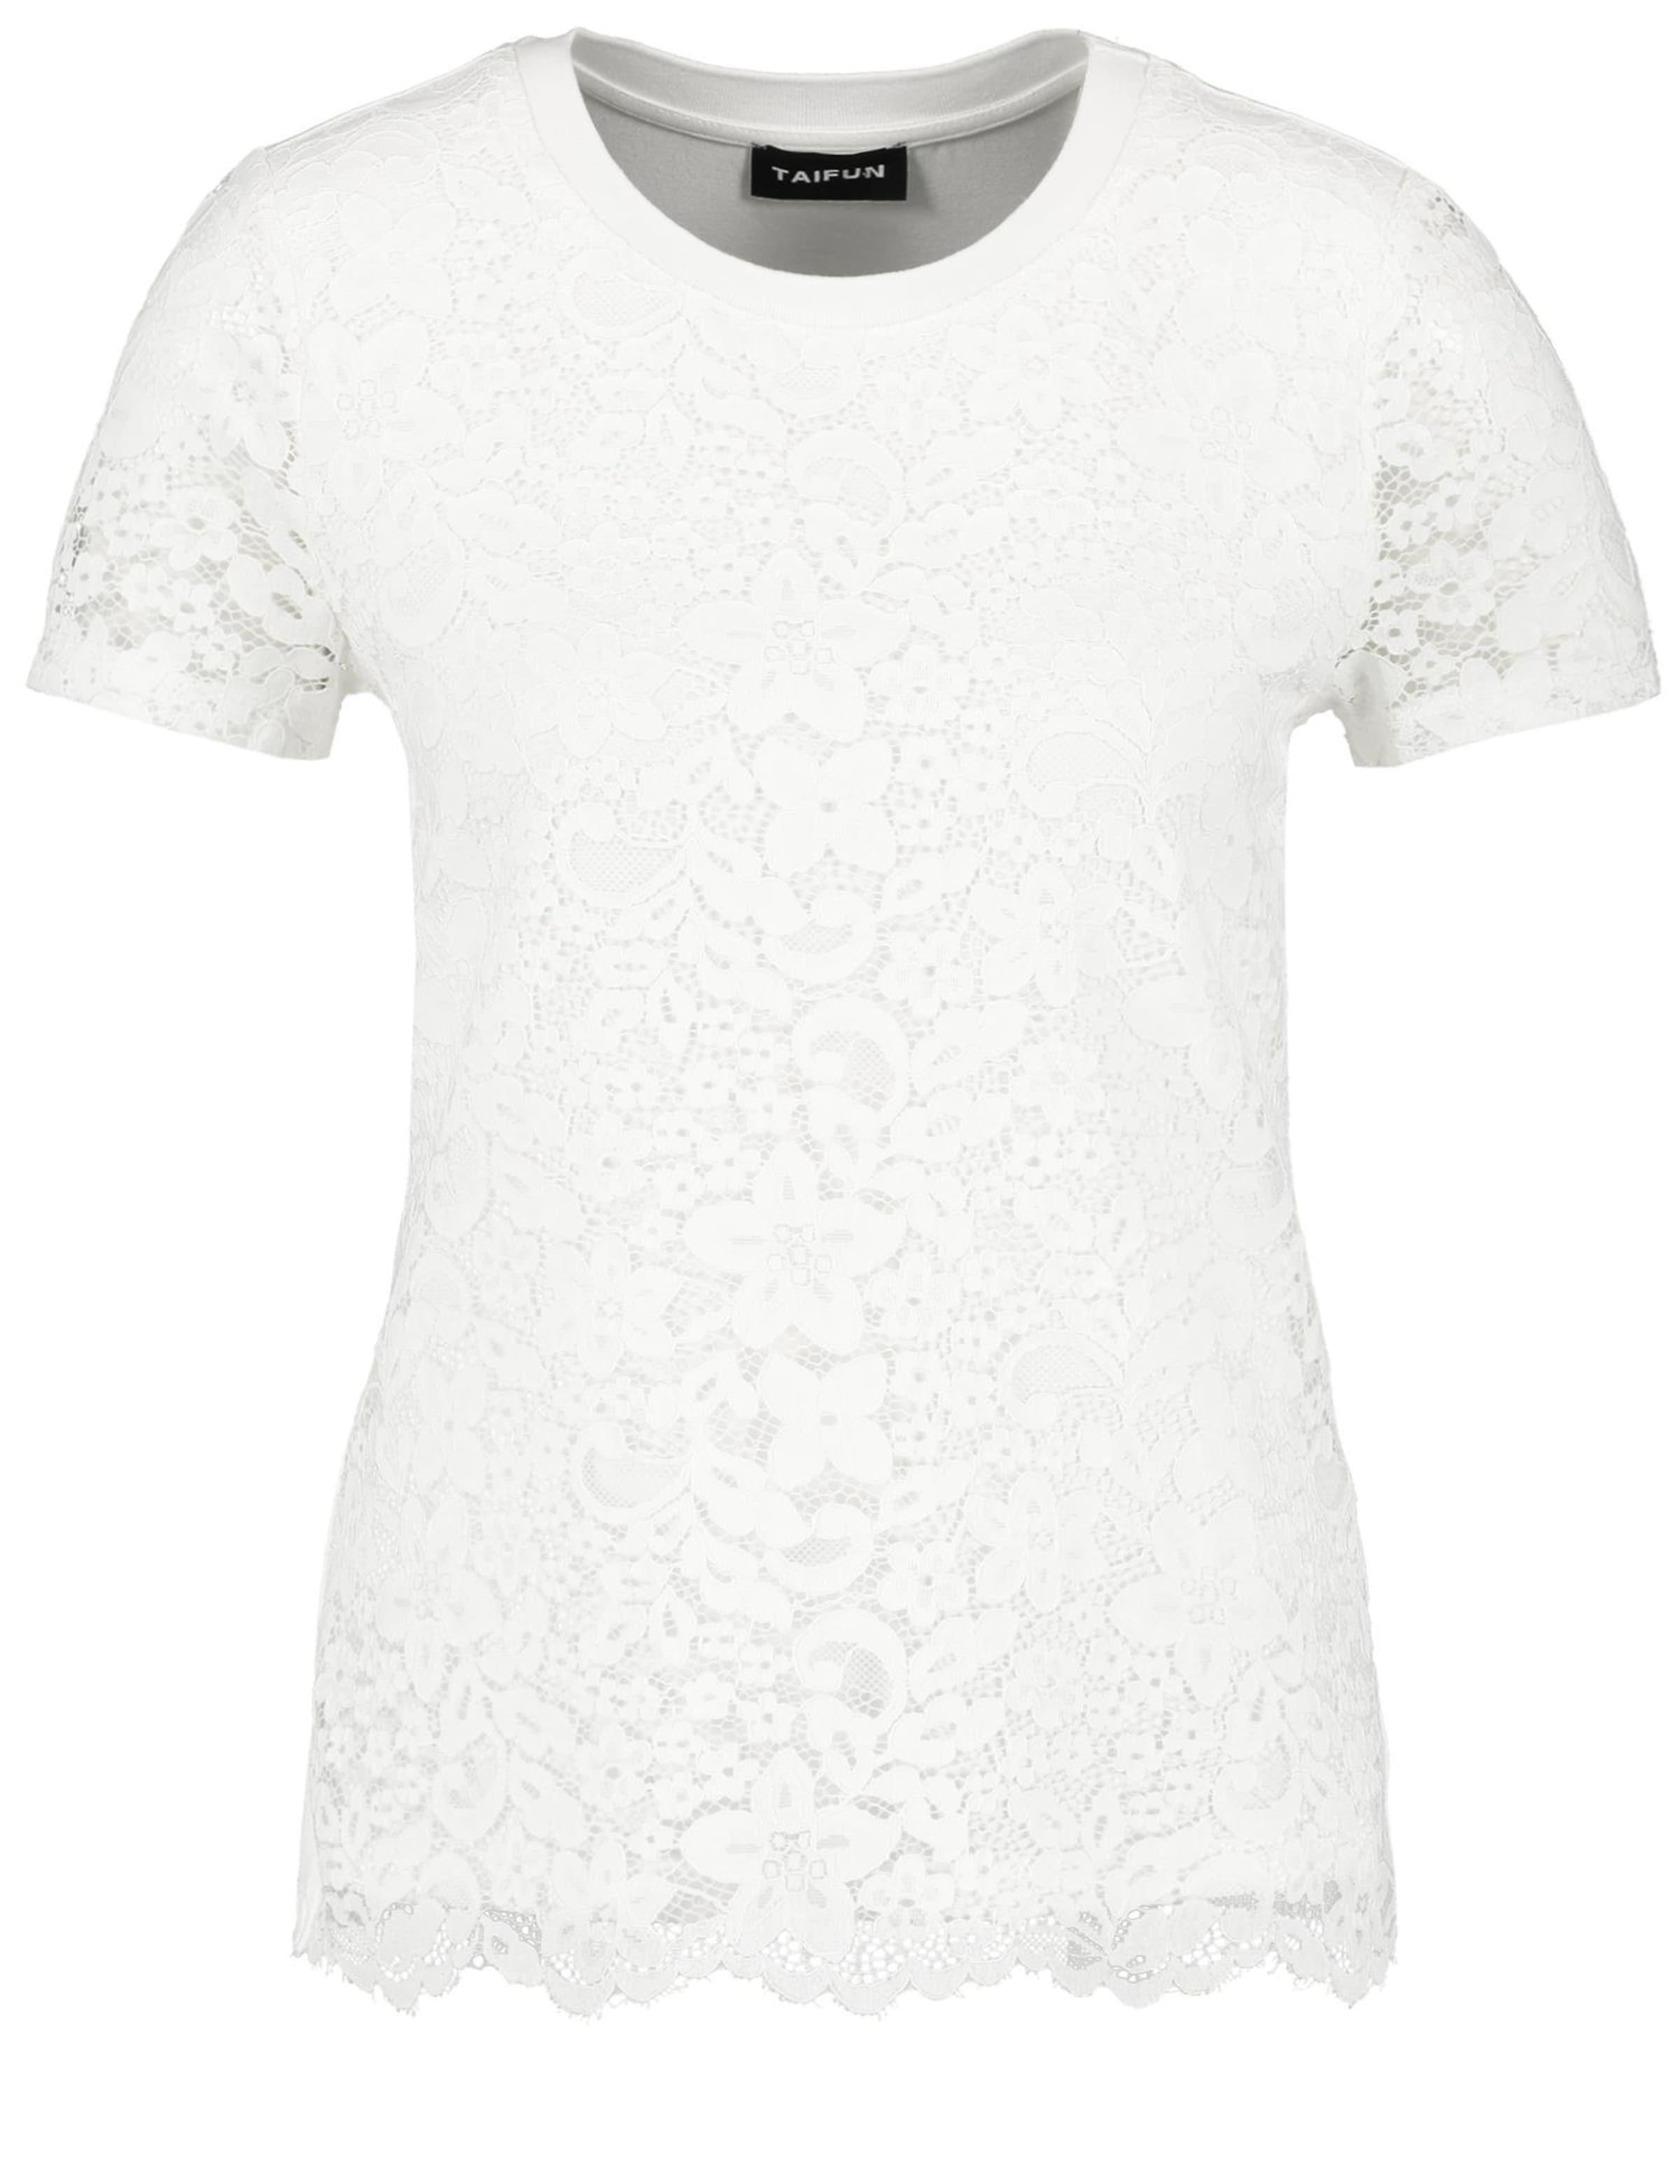 In Offwhite Offwhite T Taifun Taifun shirt shirt T In N8mvwn0Oy